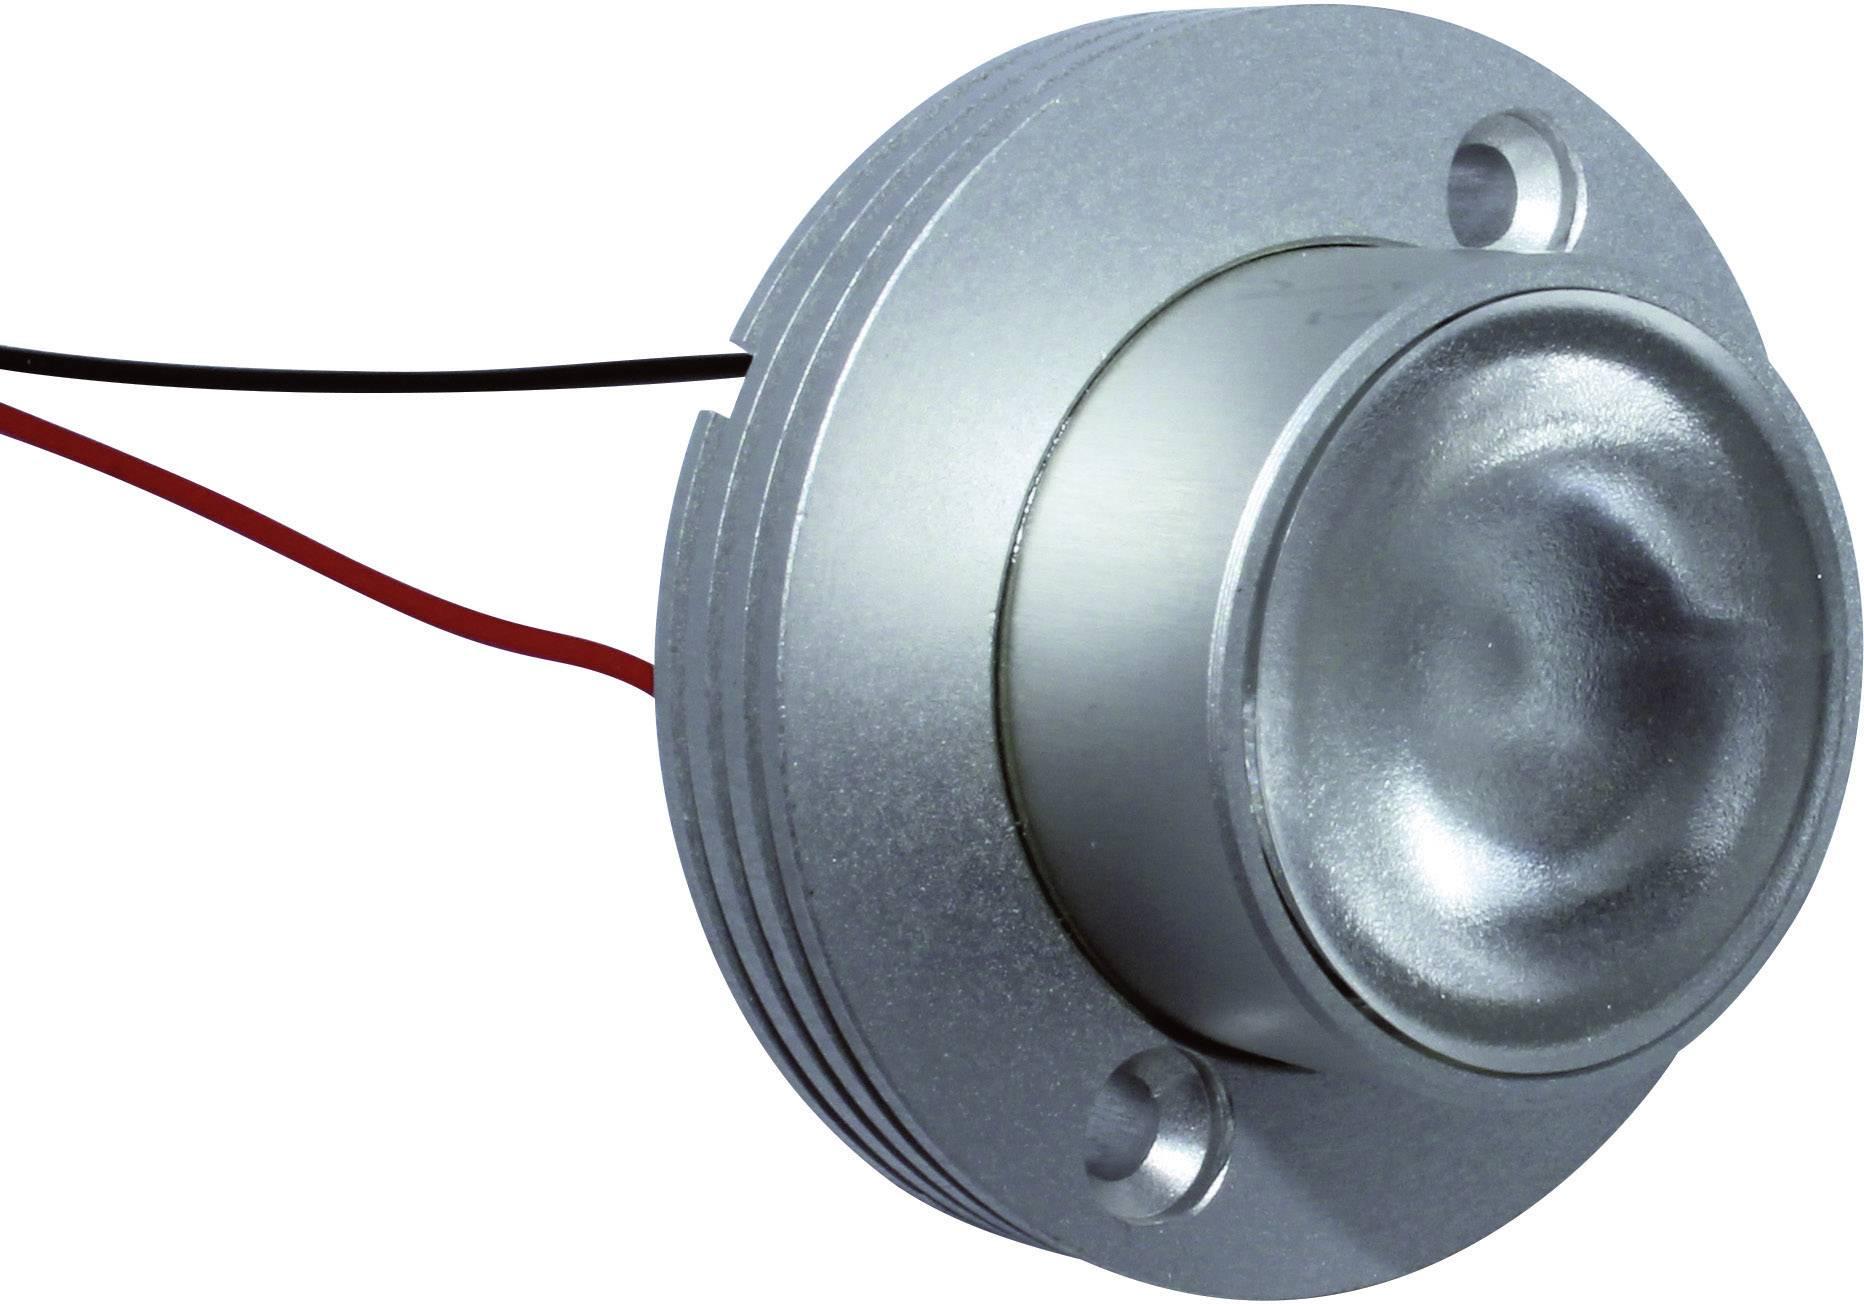 HighPower LED-spot Signal Construct QAUR1361L030, 30 °, 140 lm, 1 W, 3.3 V, biela